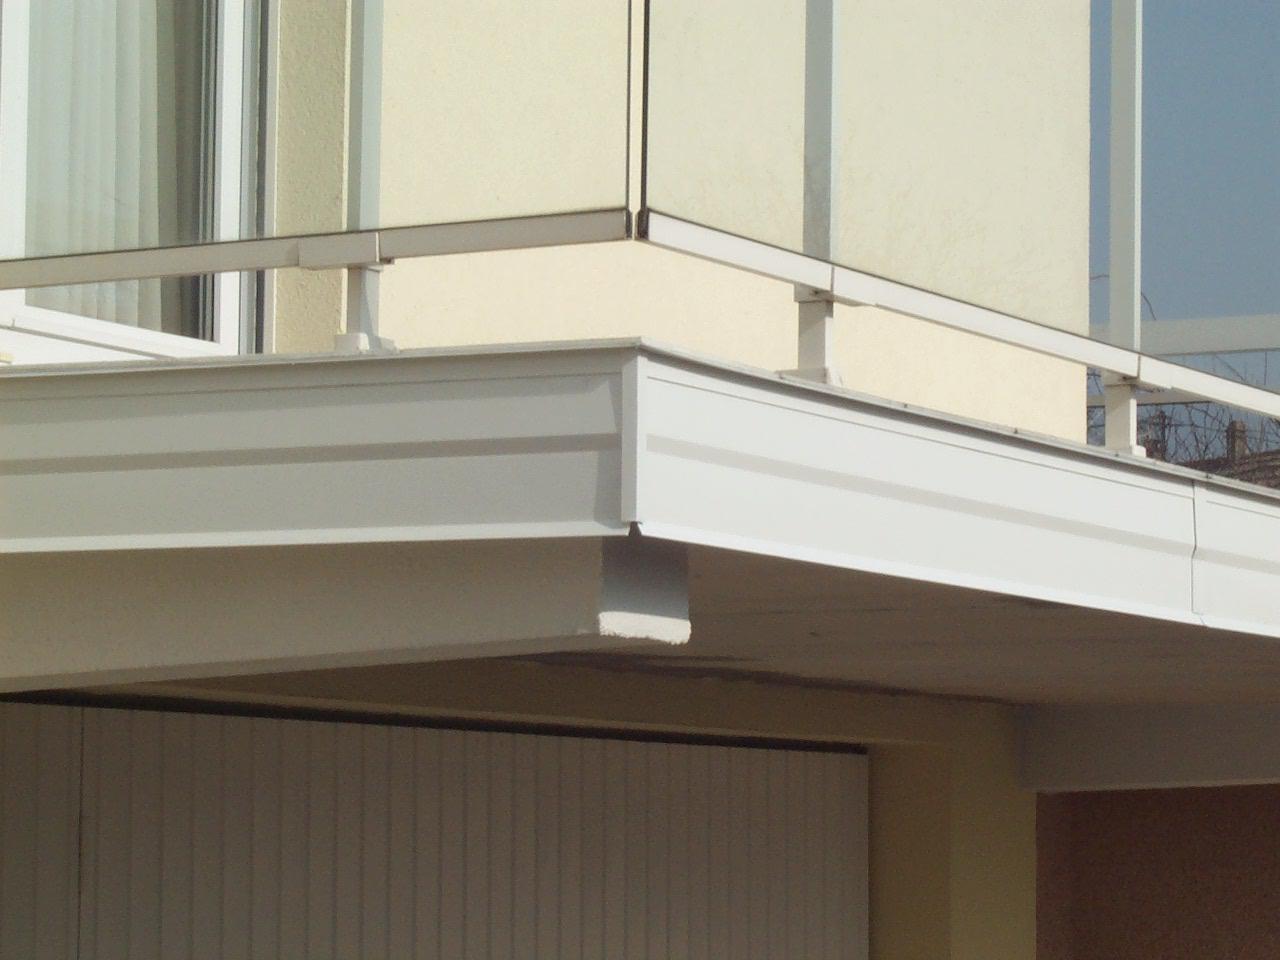 Mey 39 er herrlisheim habillage et bardage en aluminium dal - Habillage balcon ...